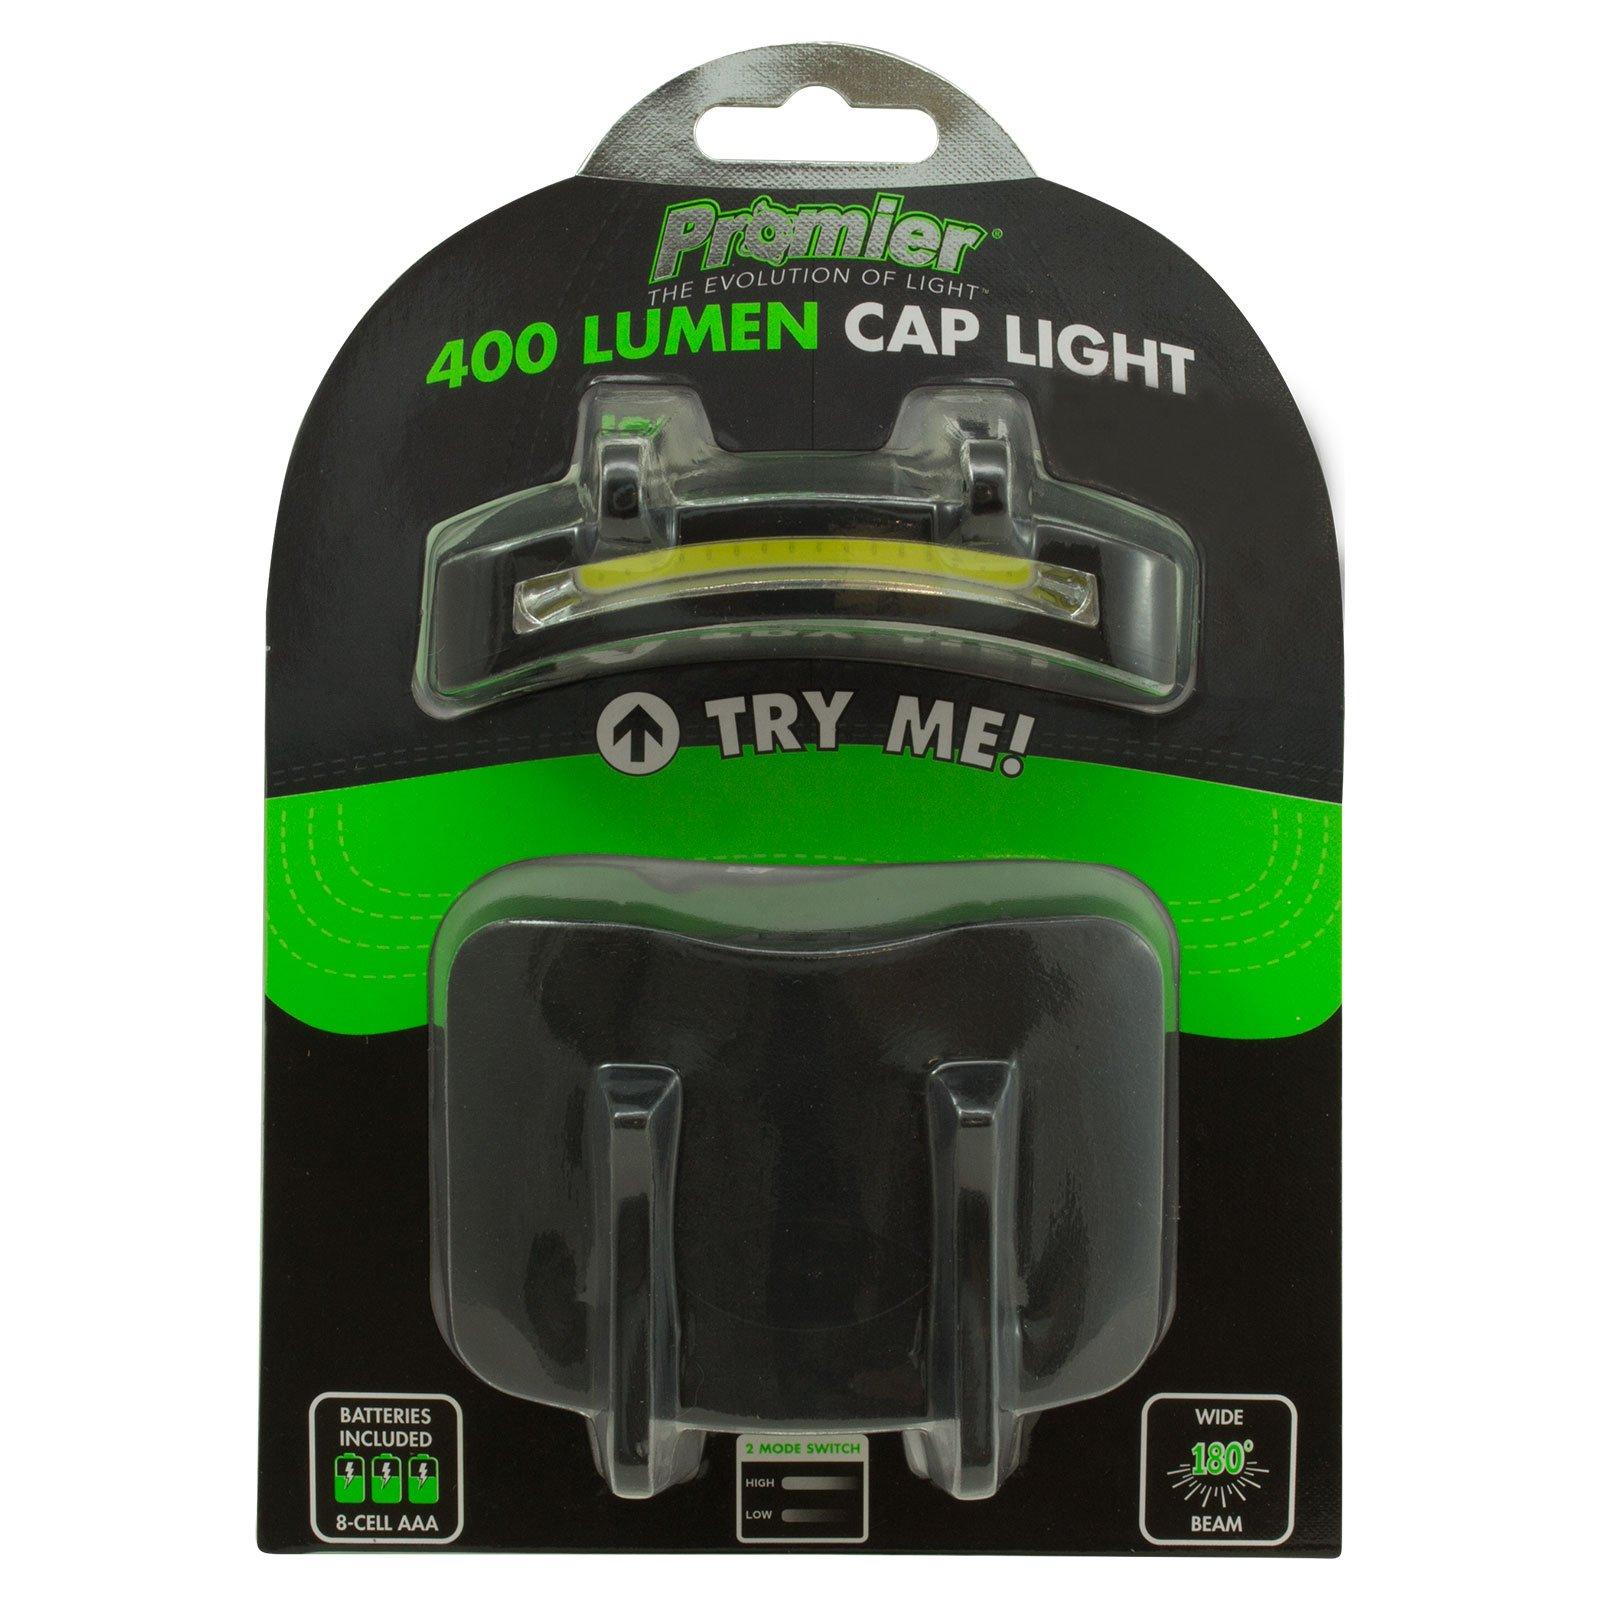 2 PACK - 400 Lumen Hi Mode / 180 Lumen Low Power Mode (2 X Cap Lights > 2 X Power & 2 X Bright) COB LED Clip On Cap Light DOUBLE BRIGHT (100% MFG Guarantee) (Black) by Apollo's Products (Image #7)